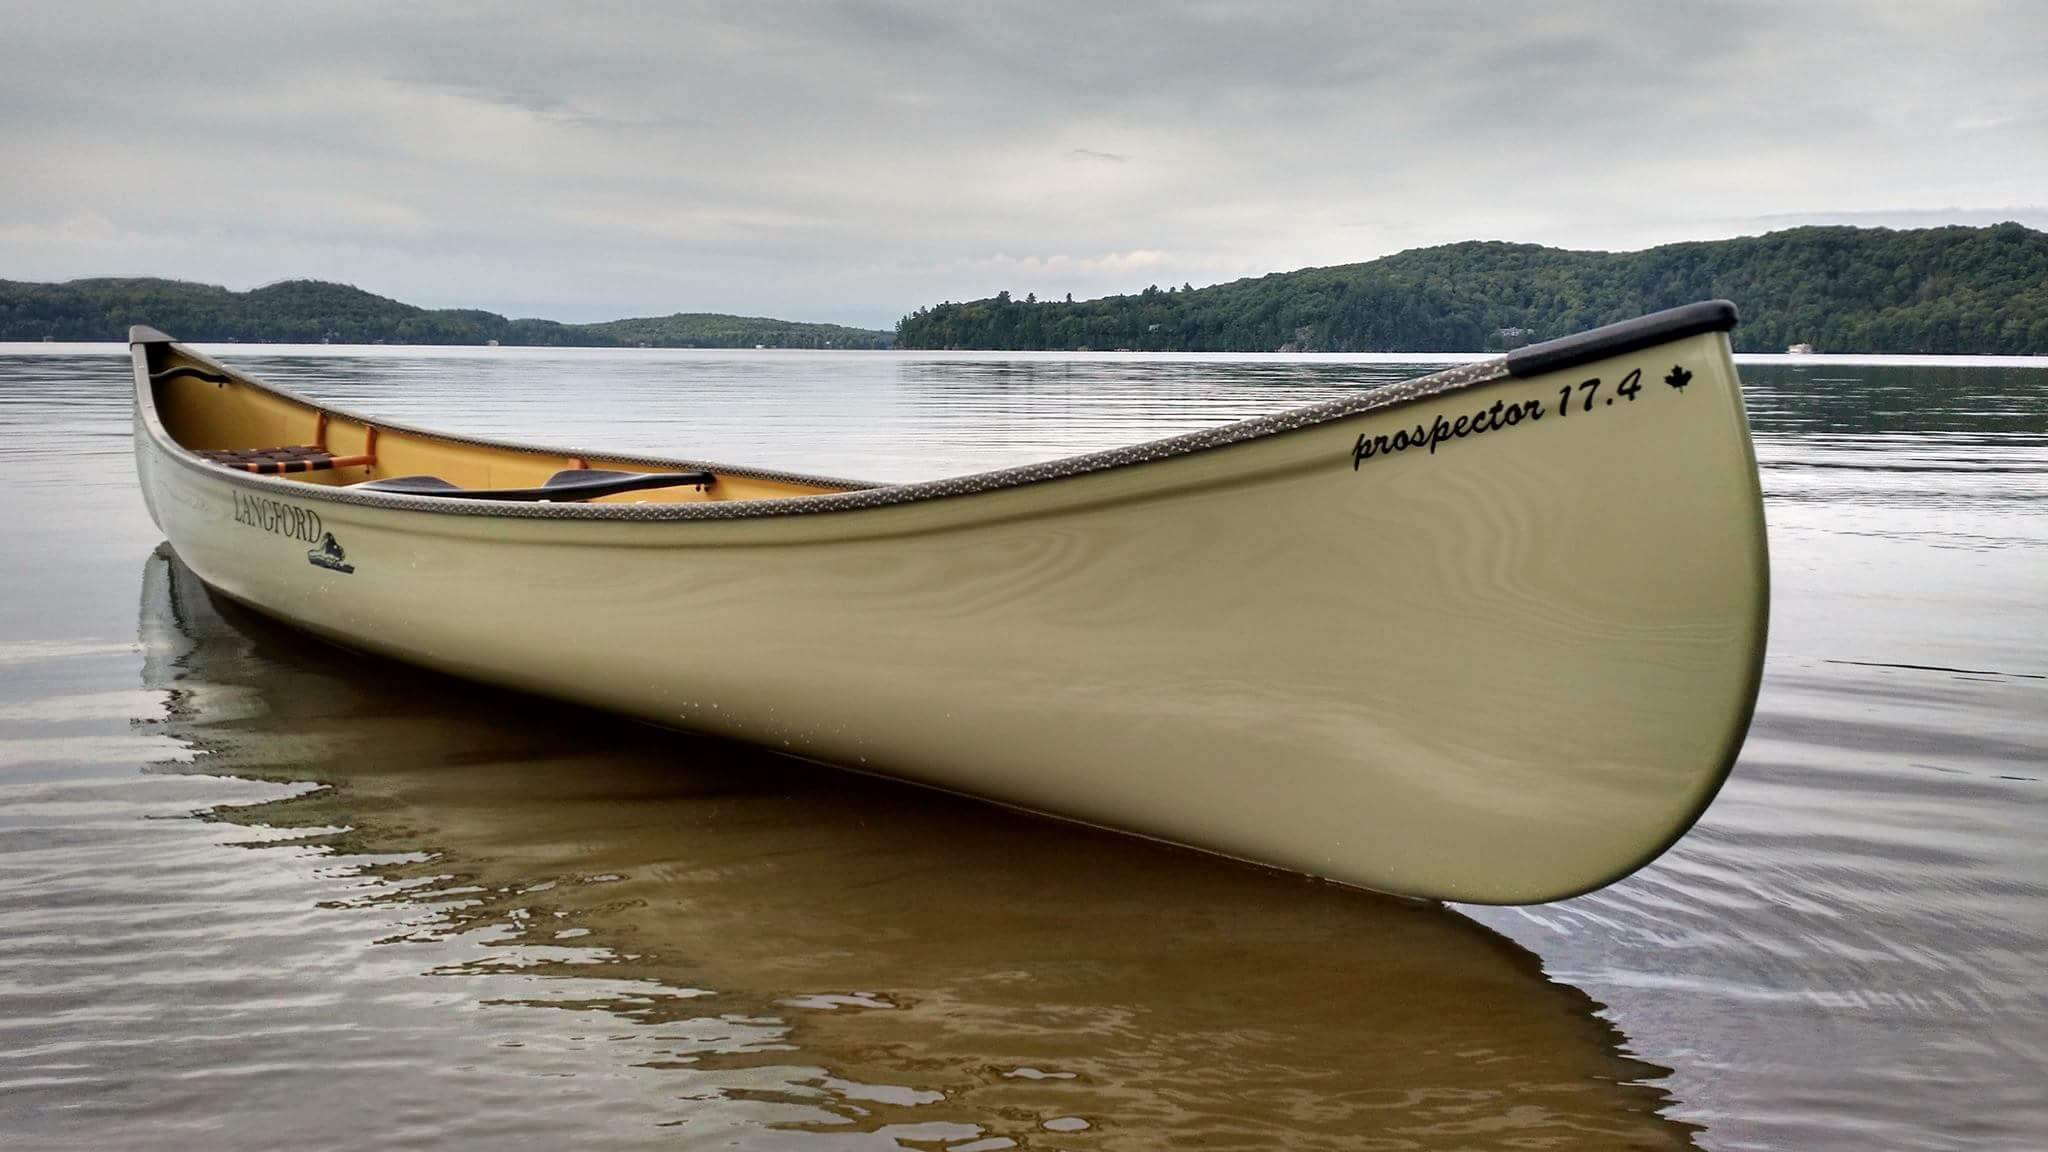 Langford Canoe Olive Drab Prospector 17.4